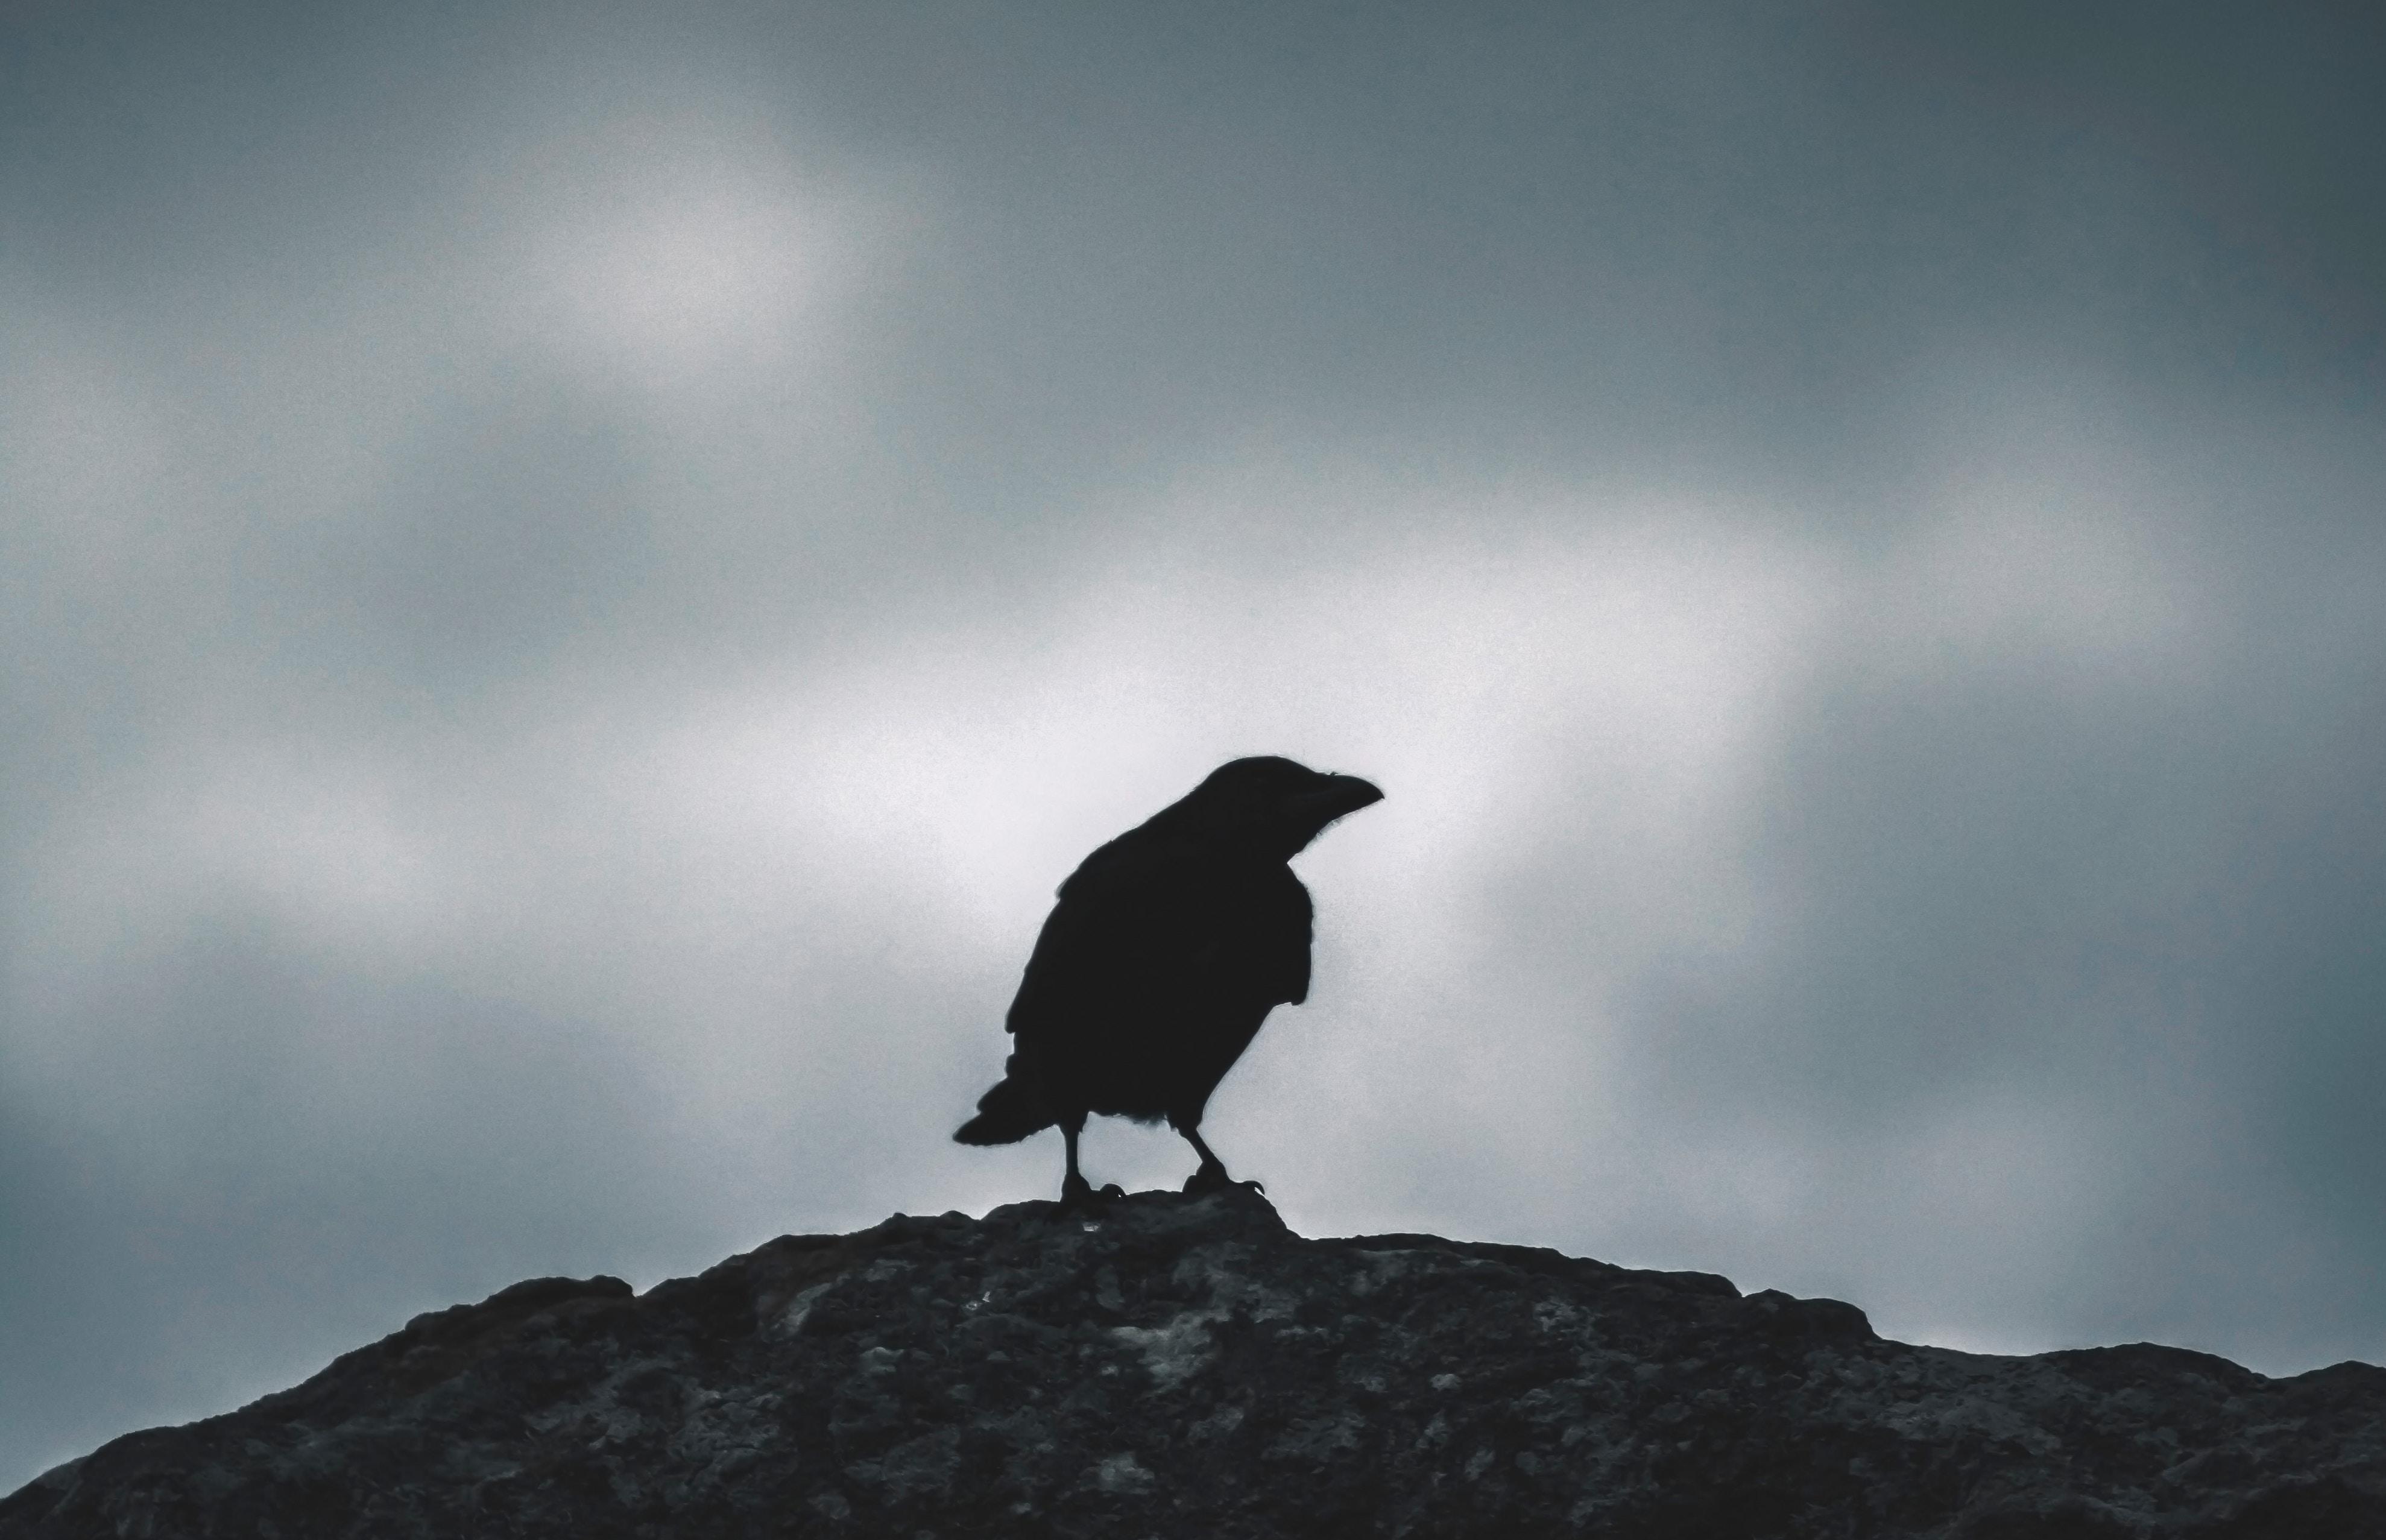 Primitive Halloween Edgar Allan Poe Spooky Journal Cupboard Tuck Turkey Quill Feather Raven